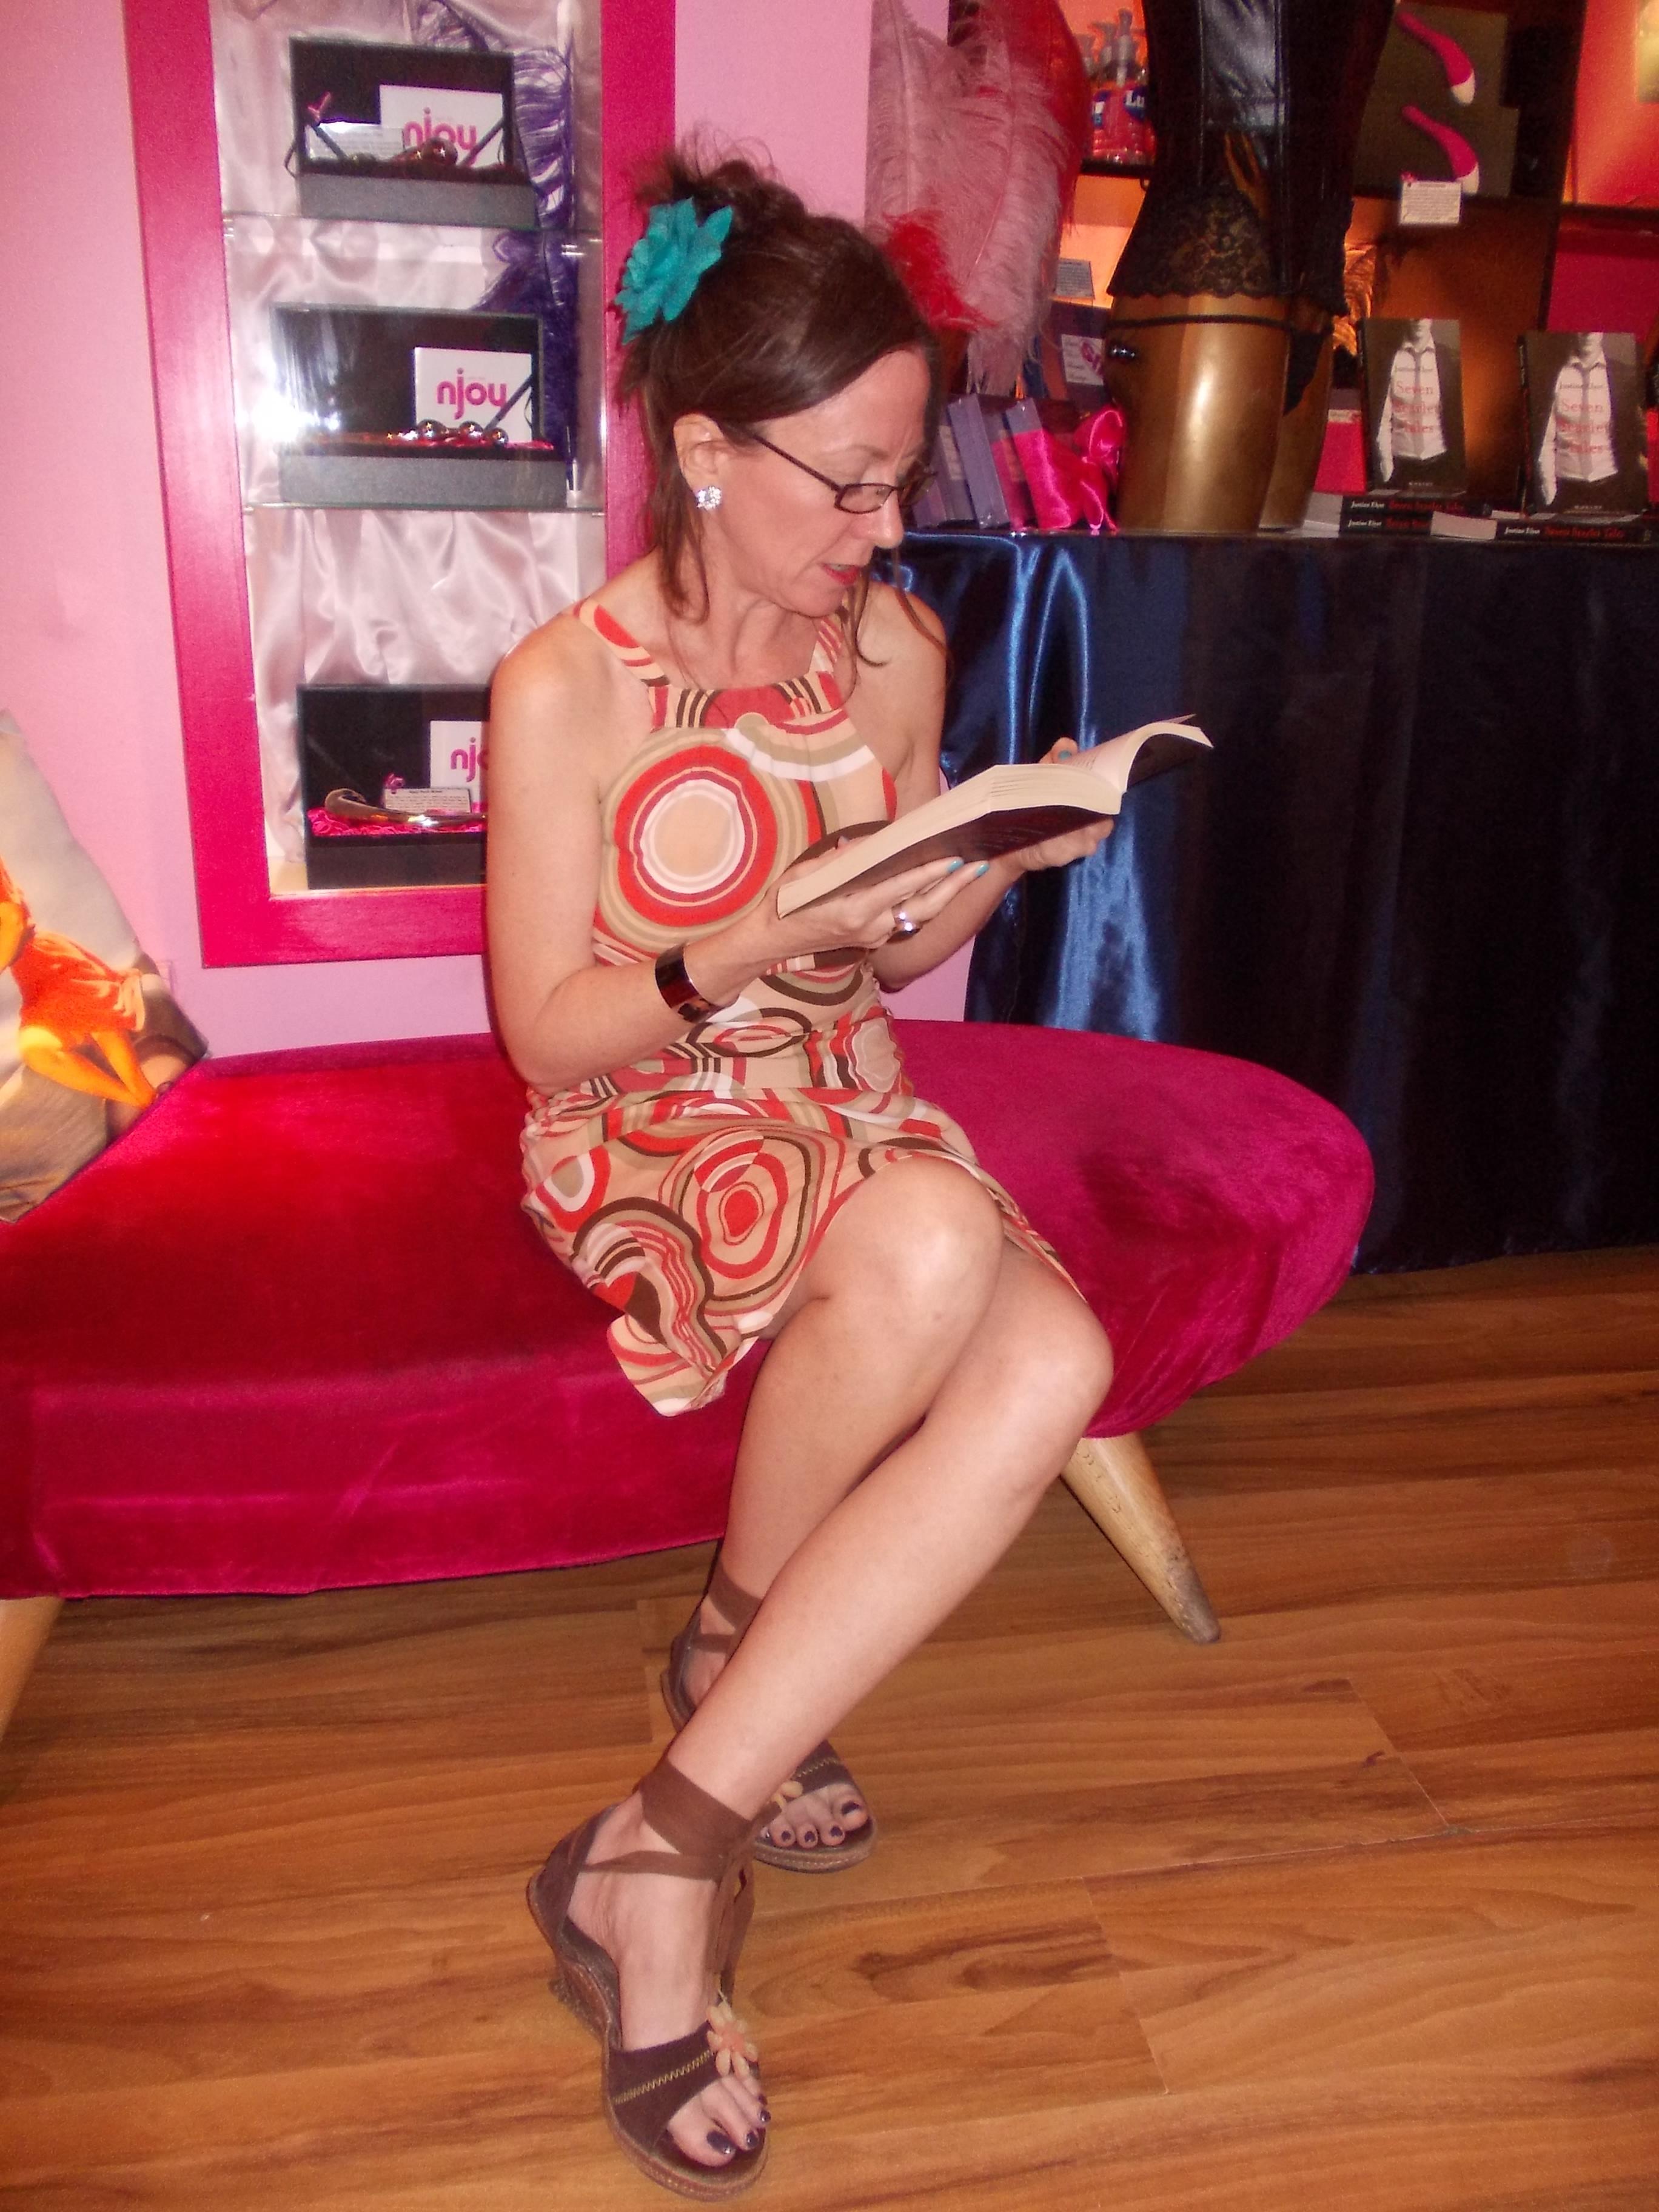 vibrator while reading